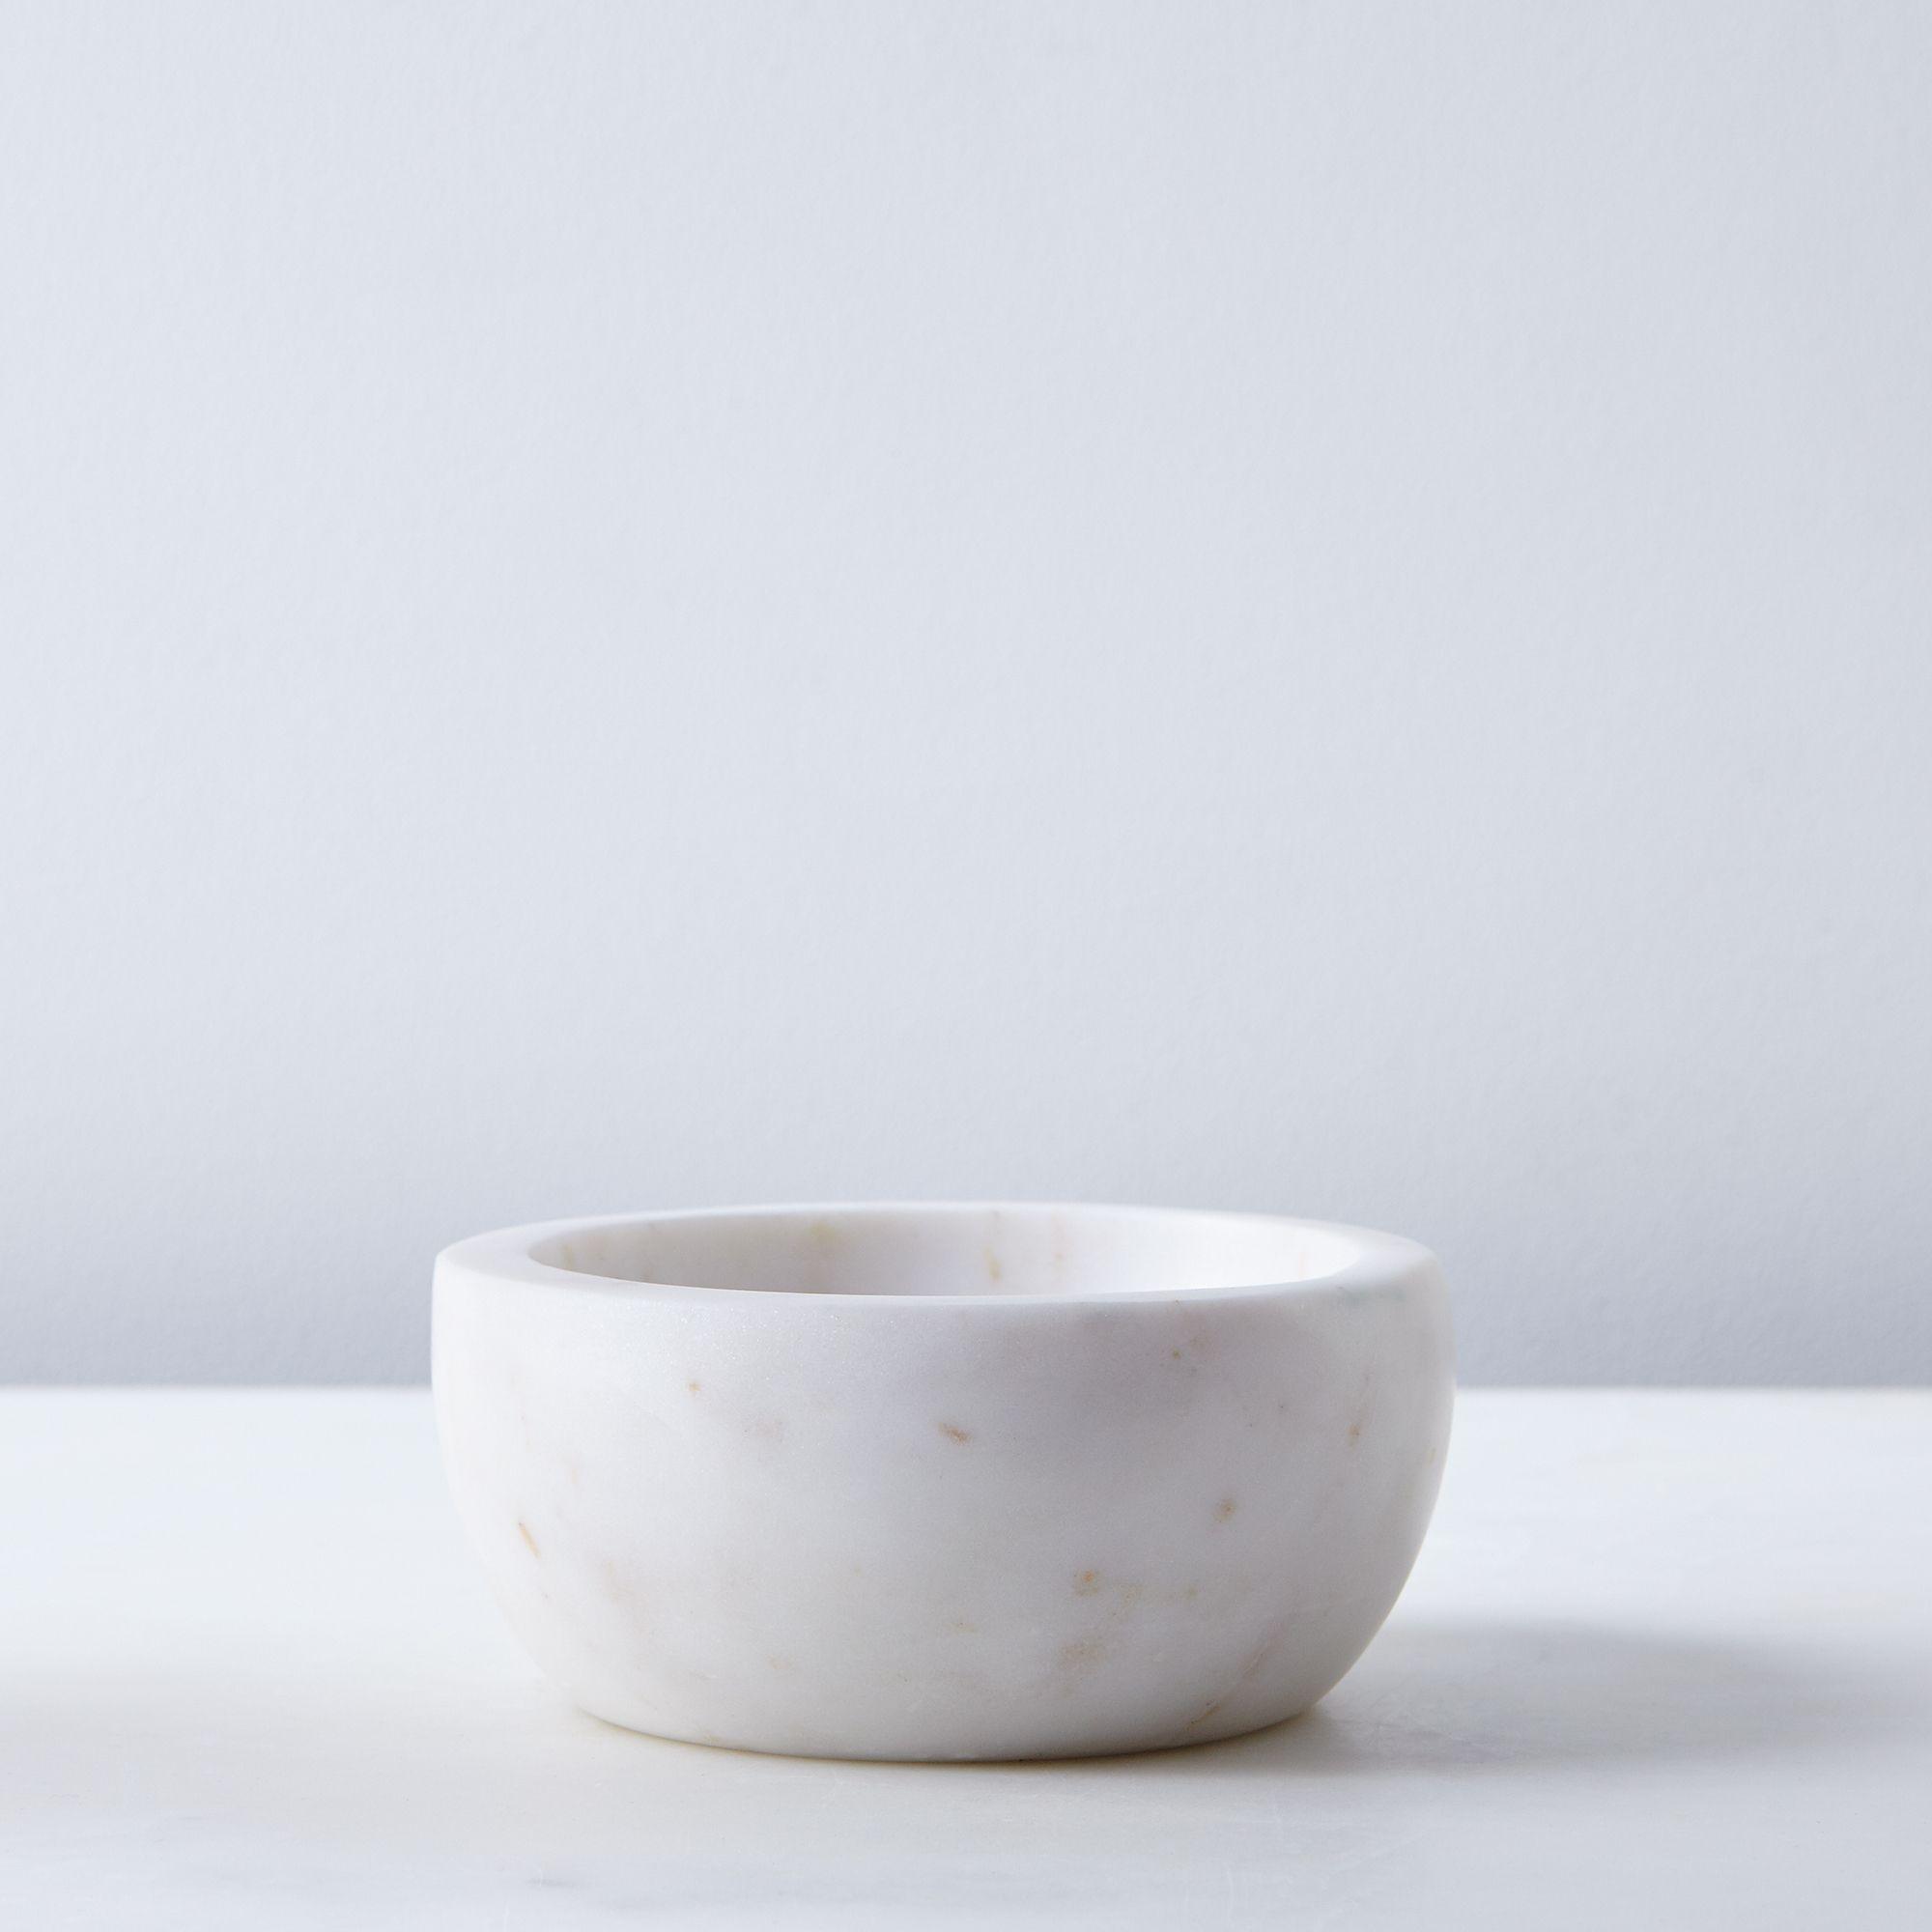 E6d1484c 5fed 4abc 9274 9fe0565bc9c1  2016 0610 hawkins new york marble nesting bowls small silo rocky luten 003